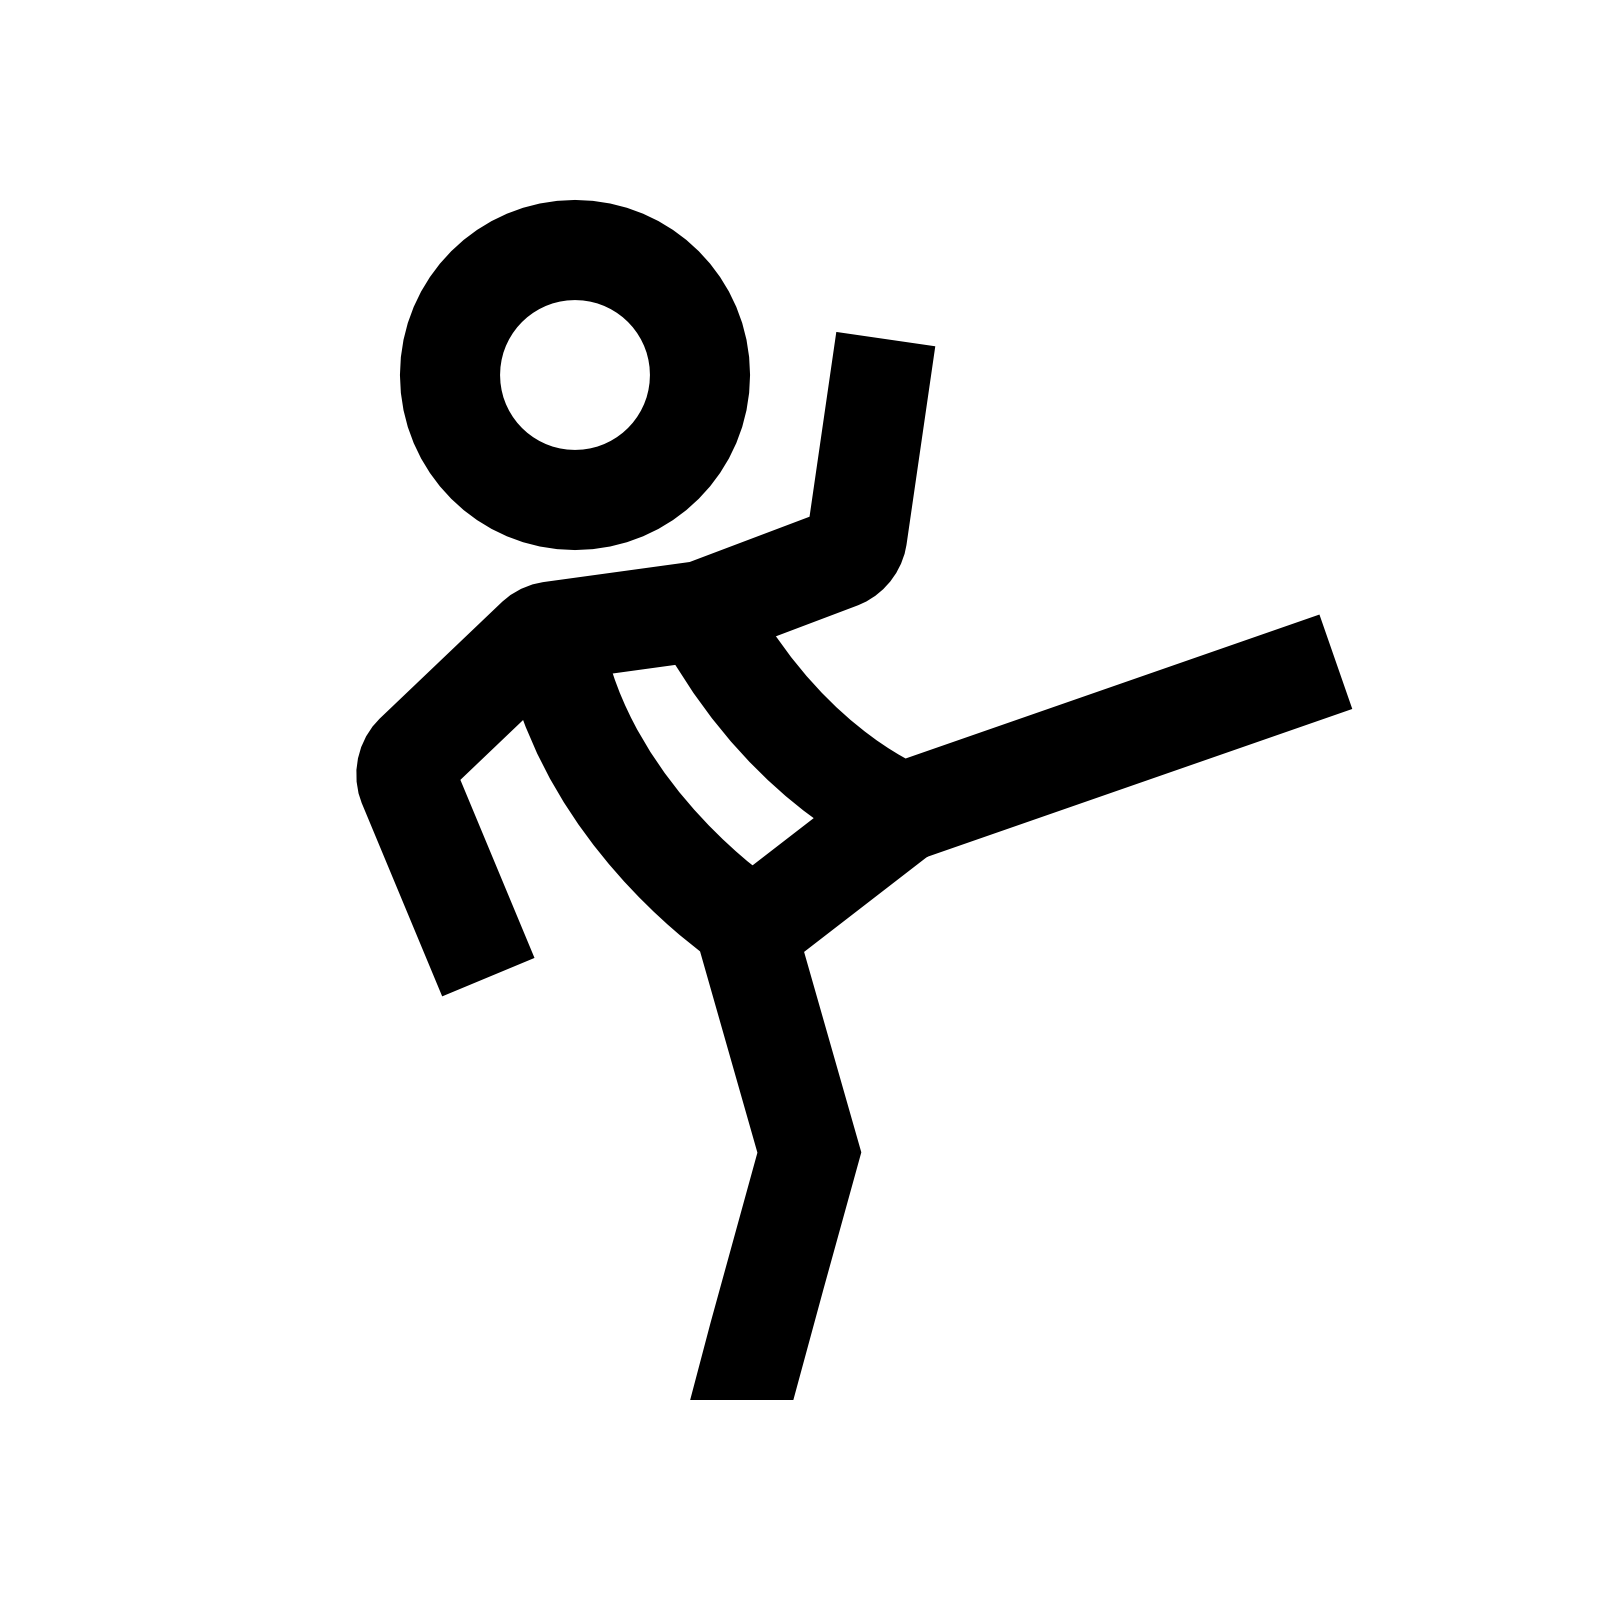 leg kicking body clipart - Clipground - 20.3KB